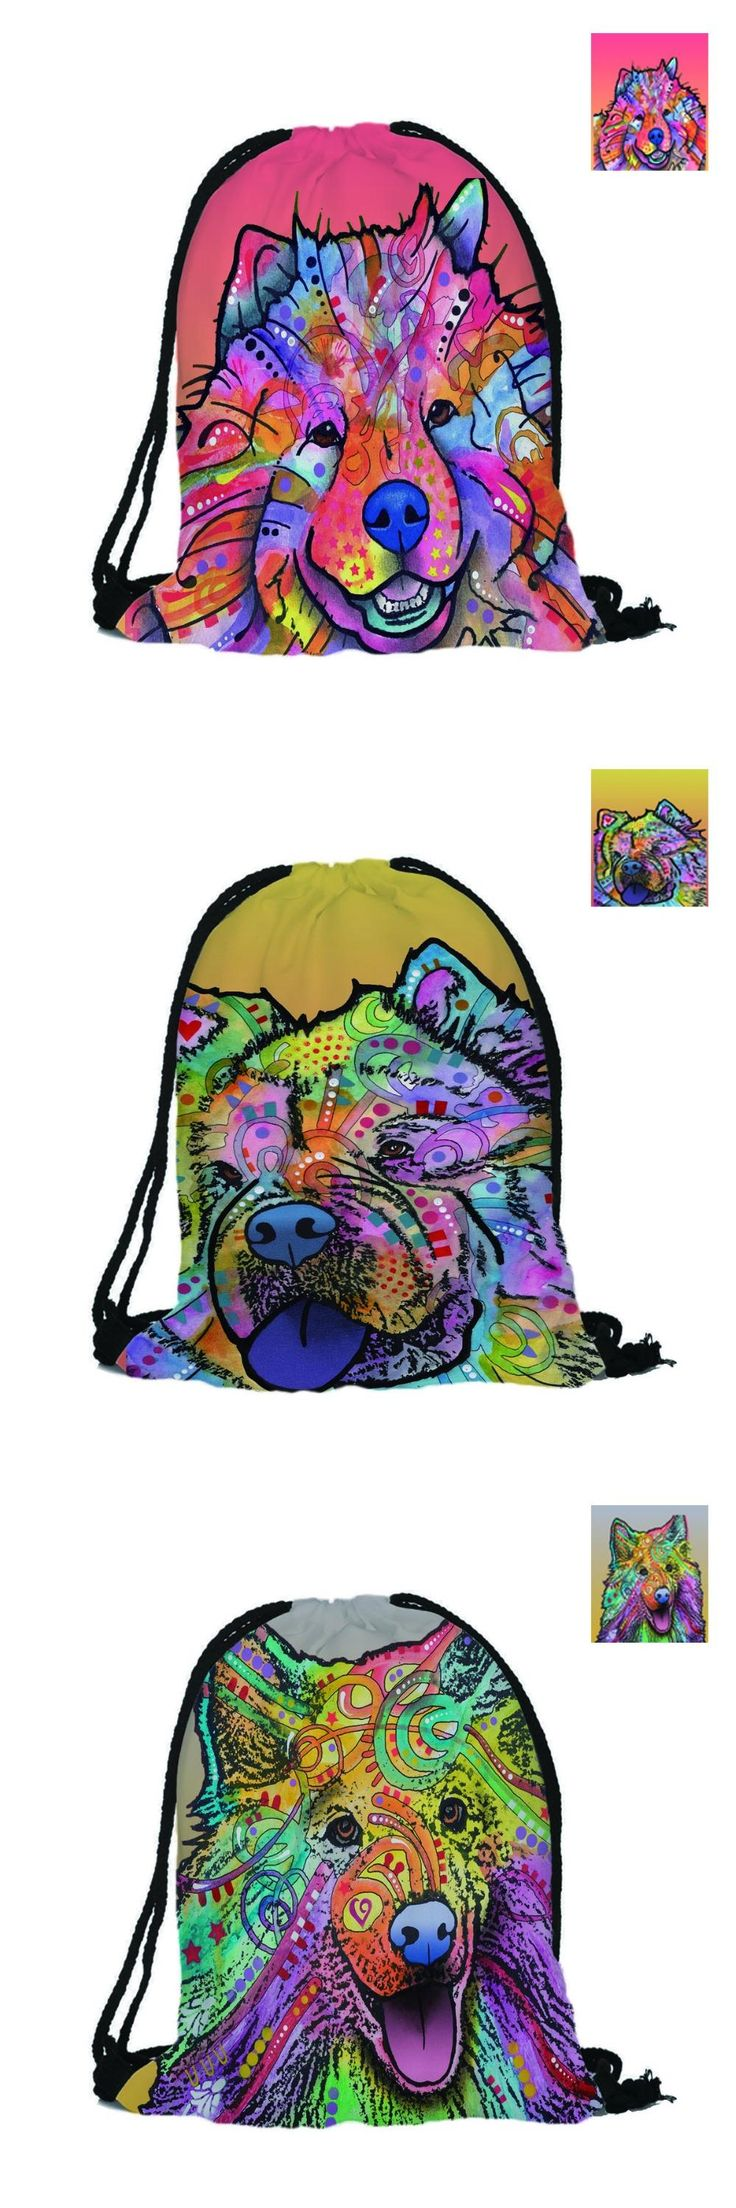 [Visit to Buy] Custom Drawstring Bag 3D Printing Backpack Samoyed Dog Mochila White Women Lovely Dog Casual Backpack  #Advertisement